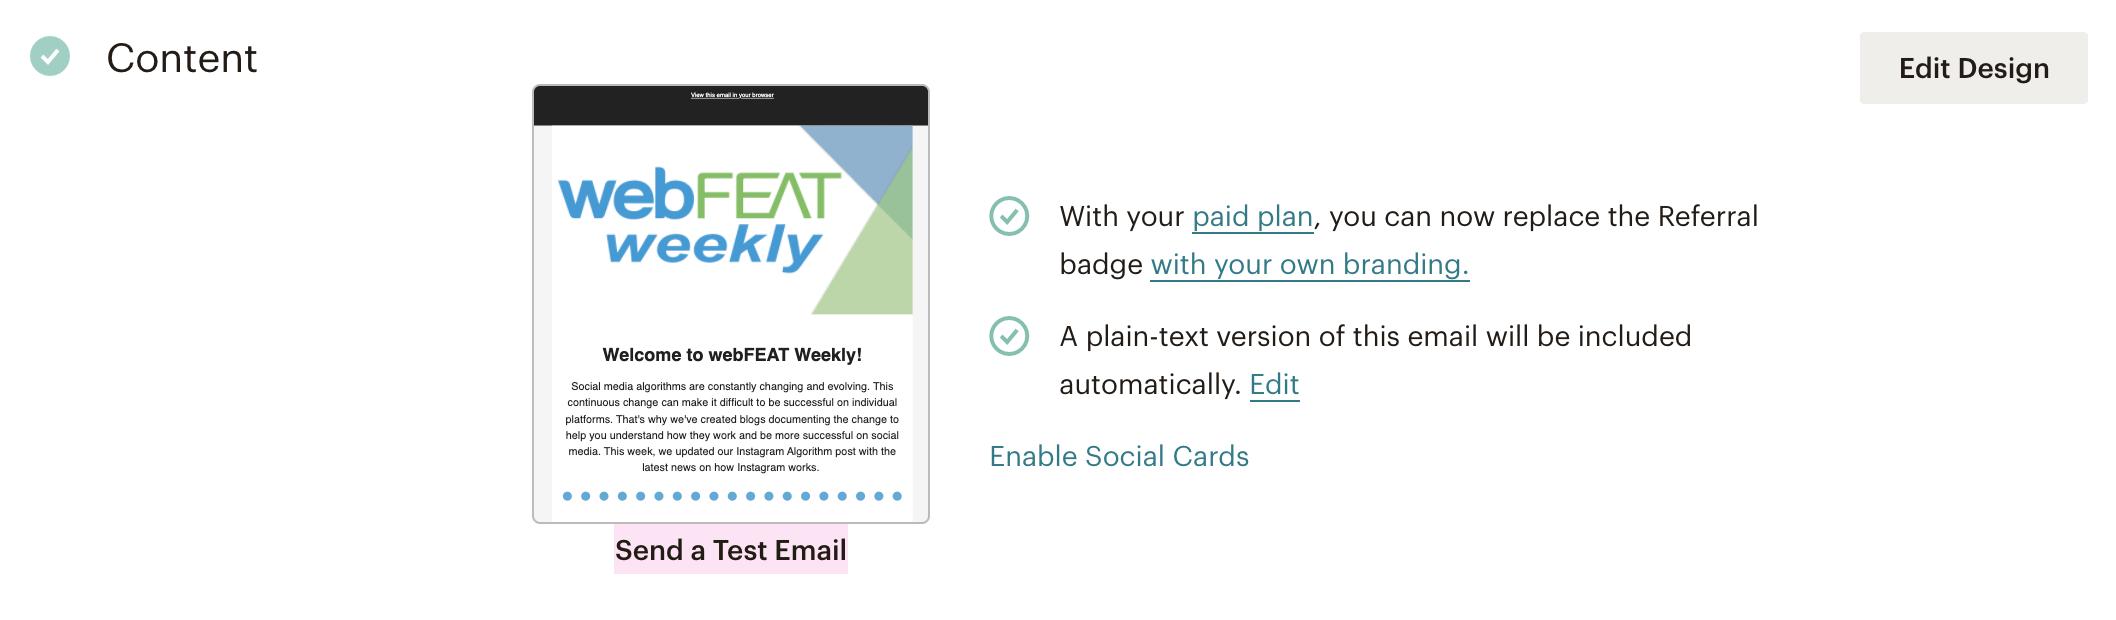 Mailchimp send test email screen